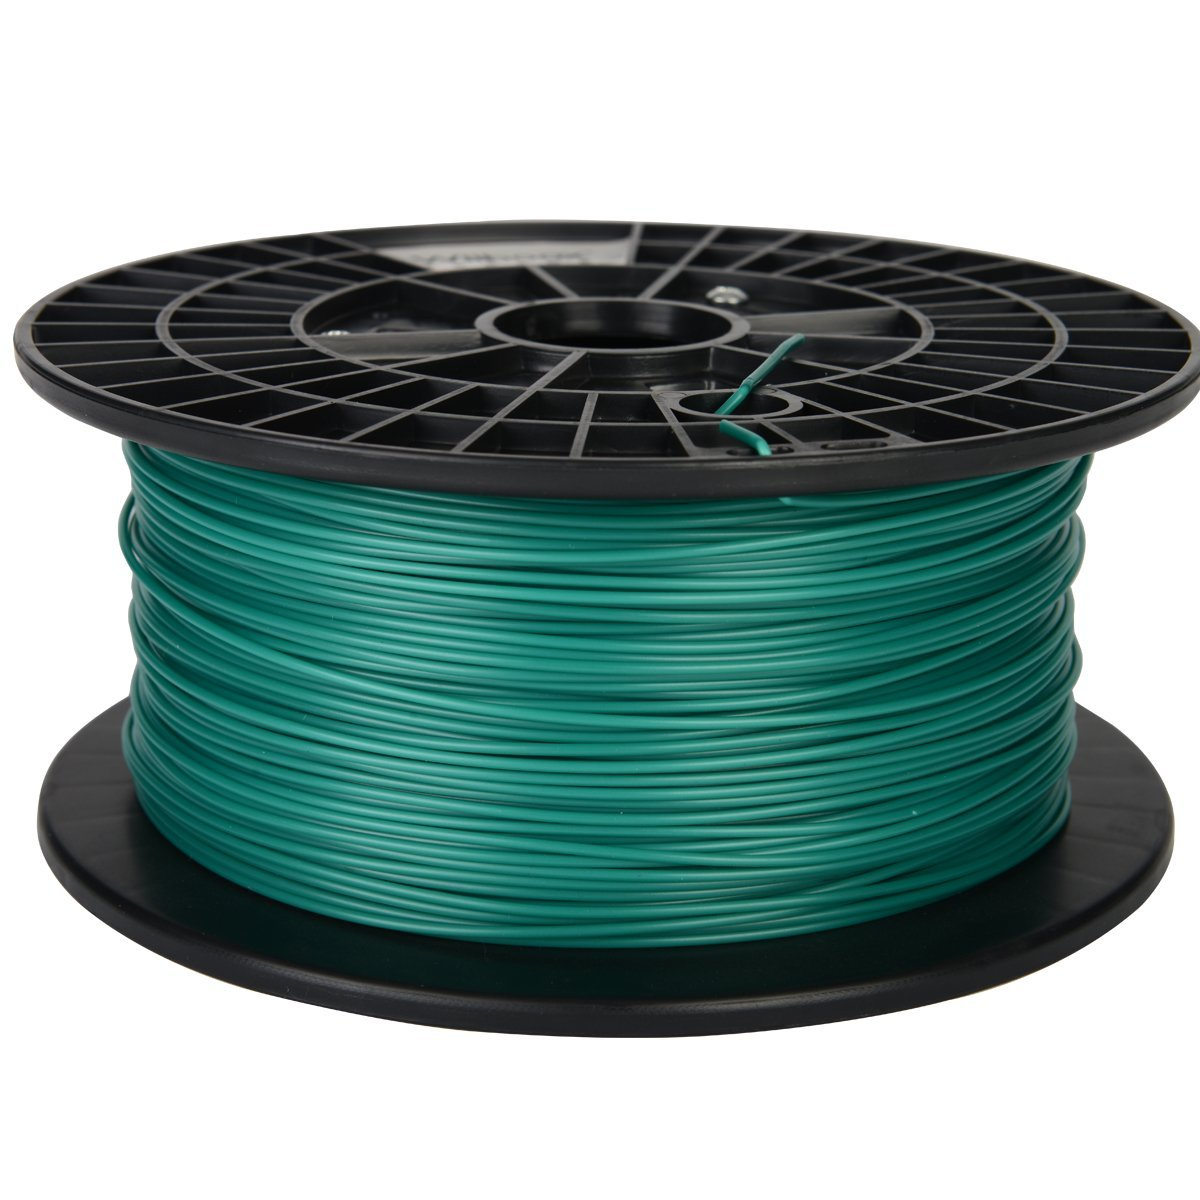 Wiiboox ASCLS00022 Pro Series Printing Filament For 3D Printer, PLA, 1.75 mm Diameter, 1000 g Spool, Green PLA.Pro Green